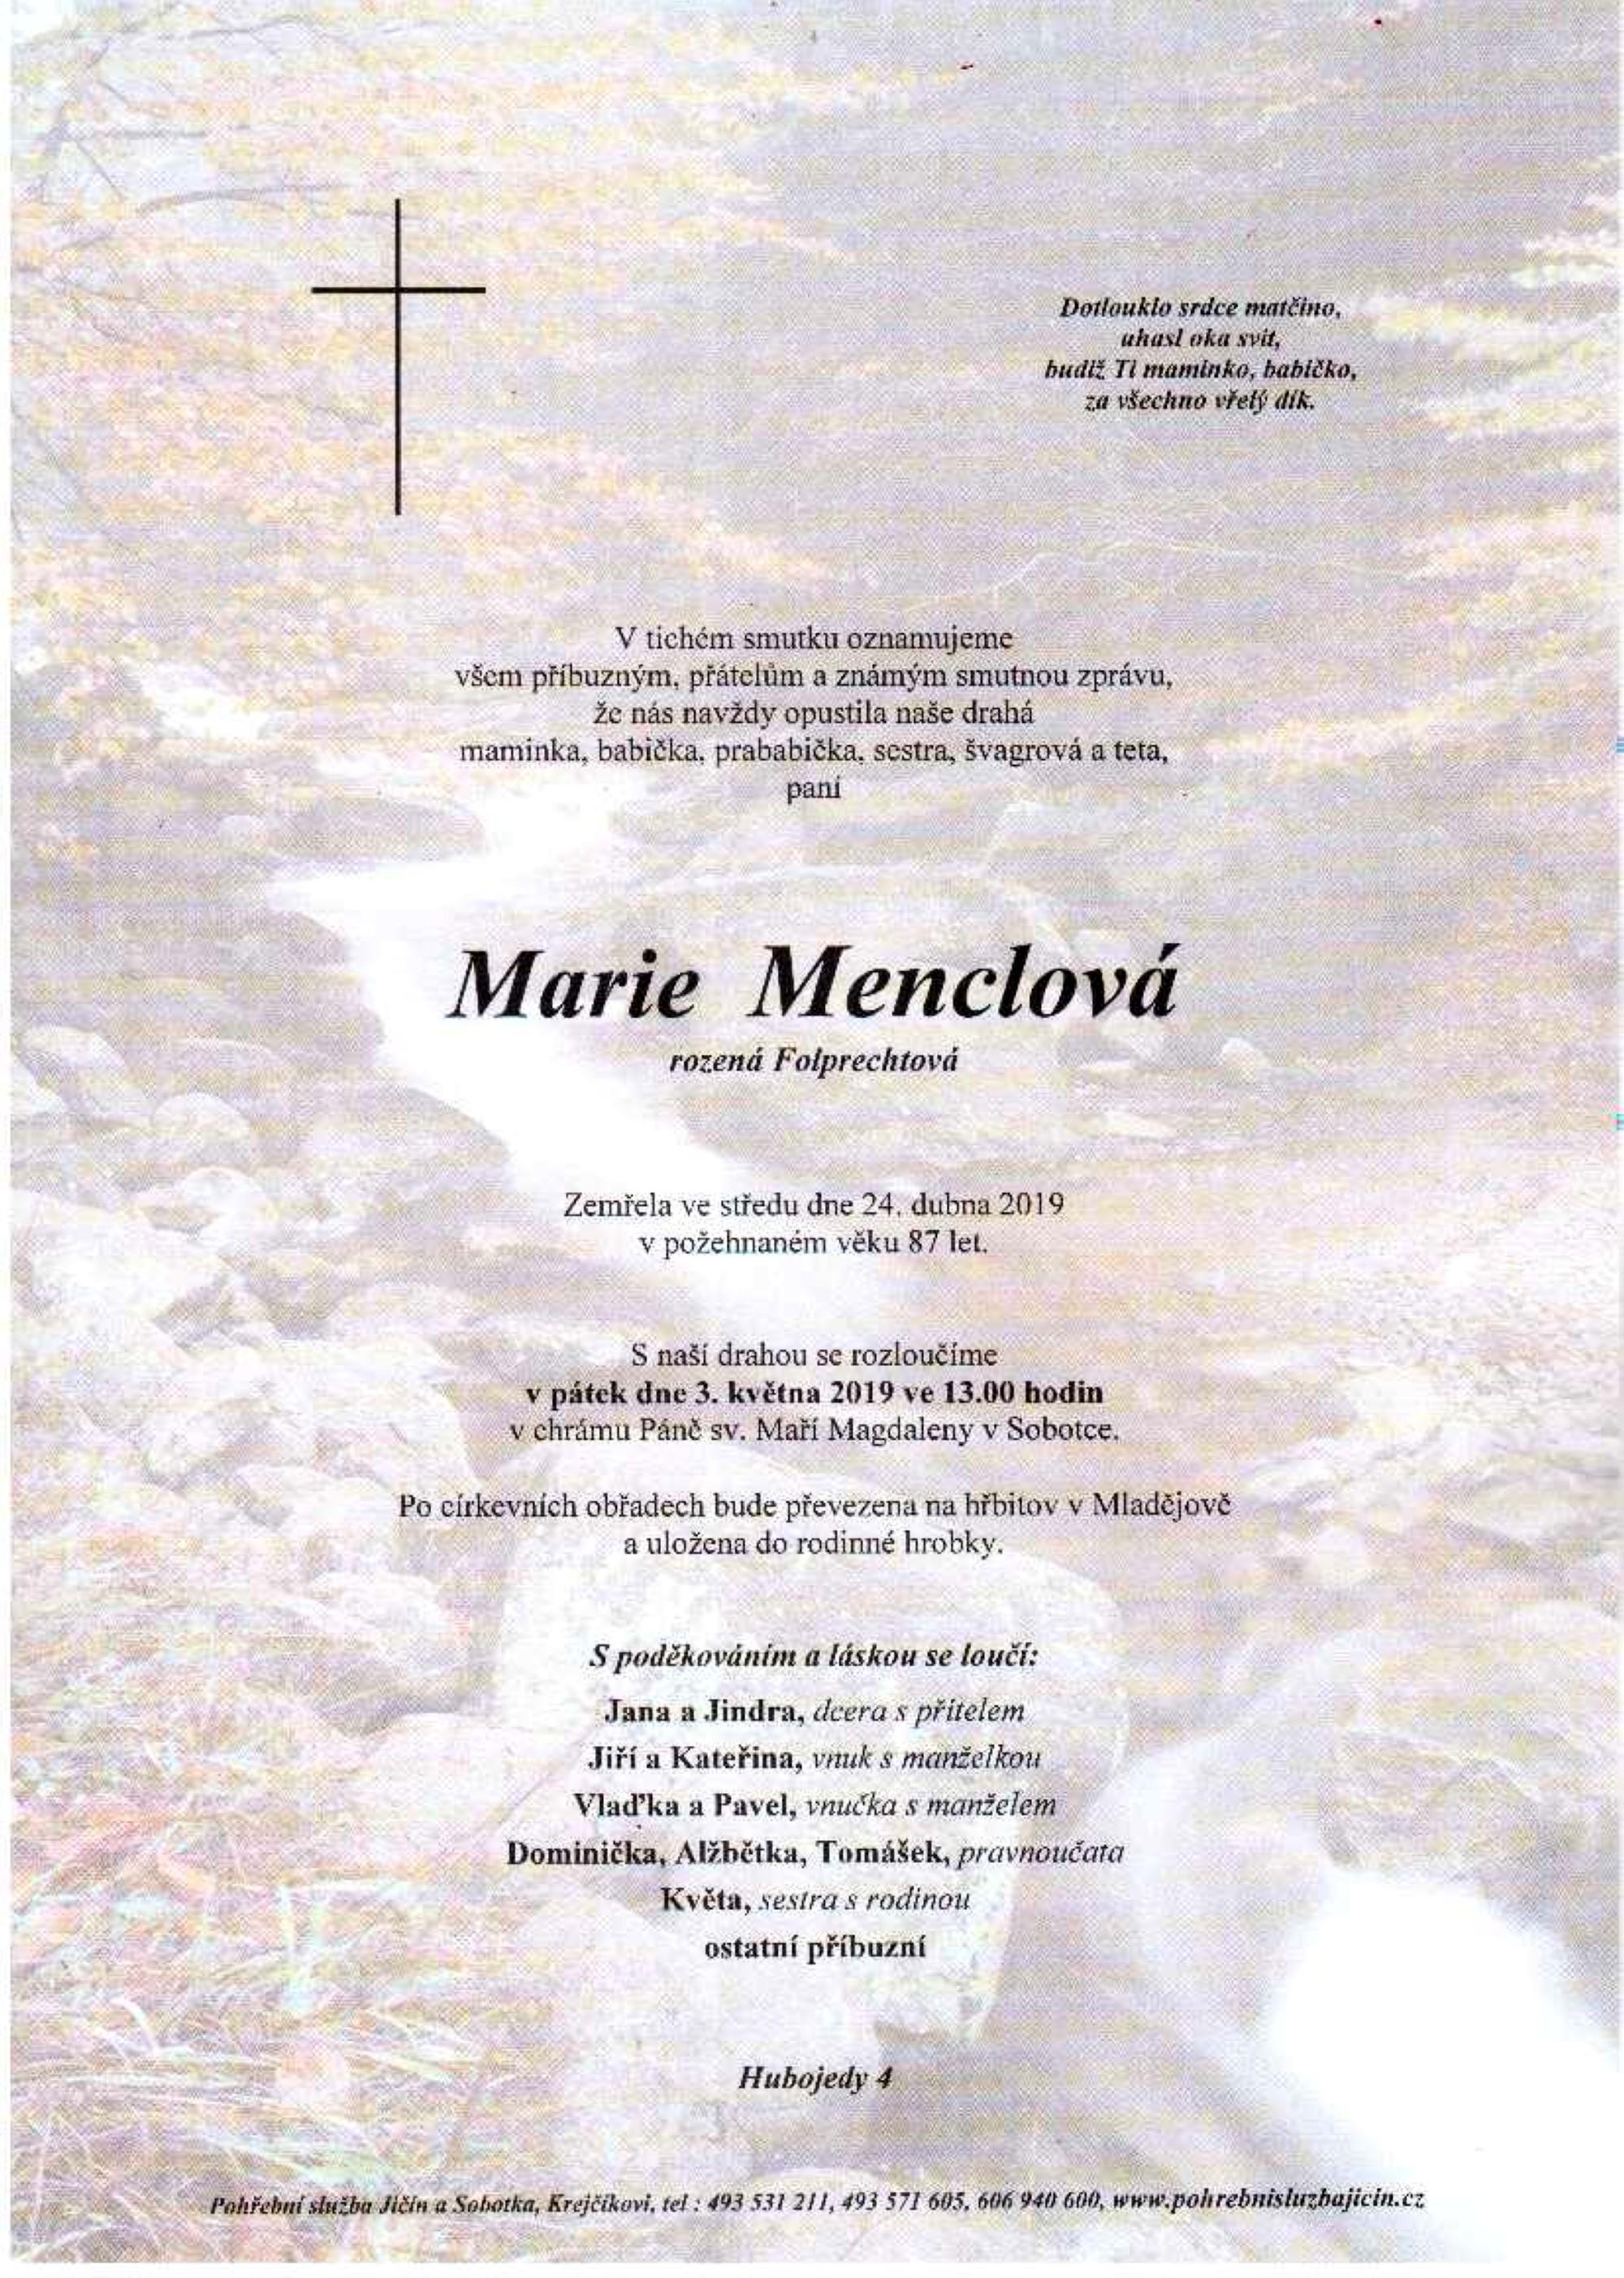 Marie Menclová